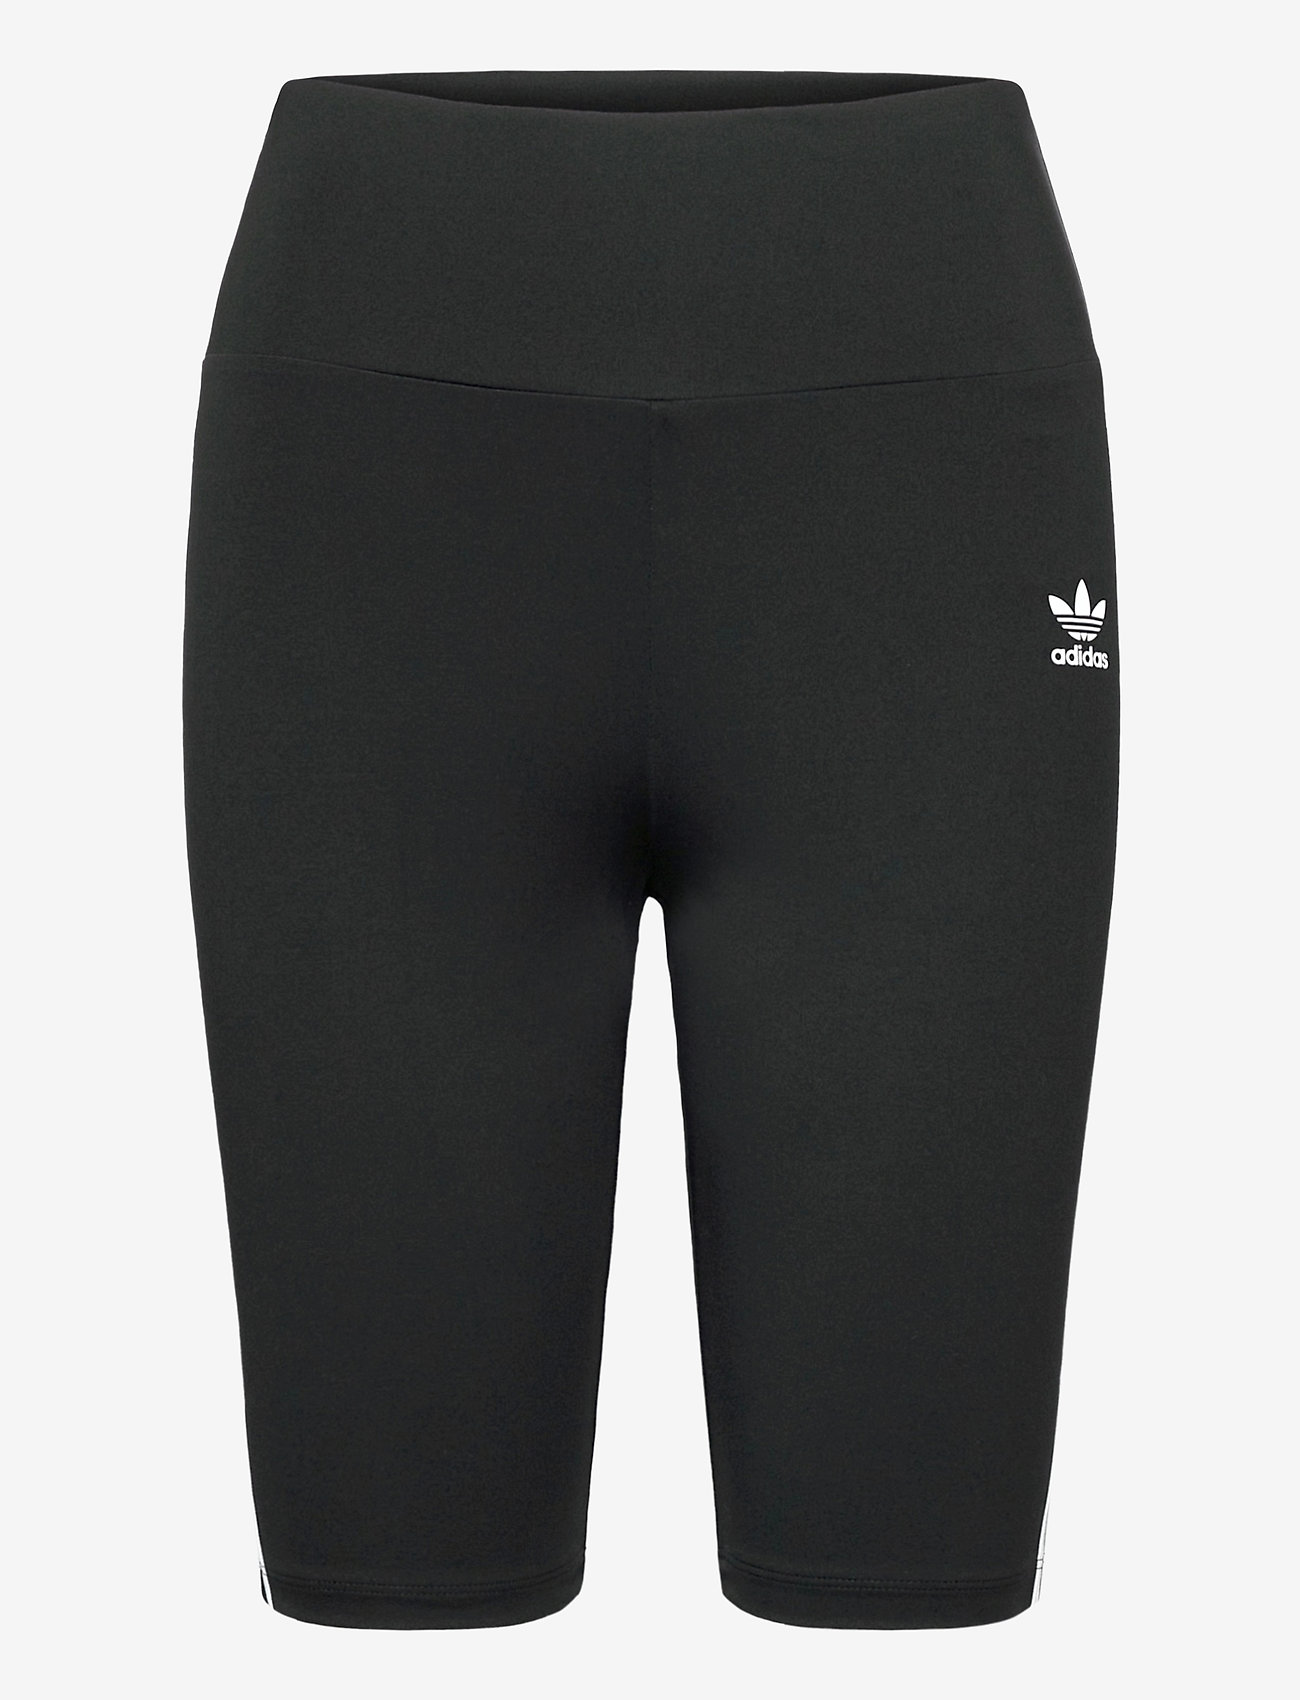 adidas Originals - Adicolor Classics Primeblue High-Waisted PB Short Tights W - träningsshorts - black - 1